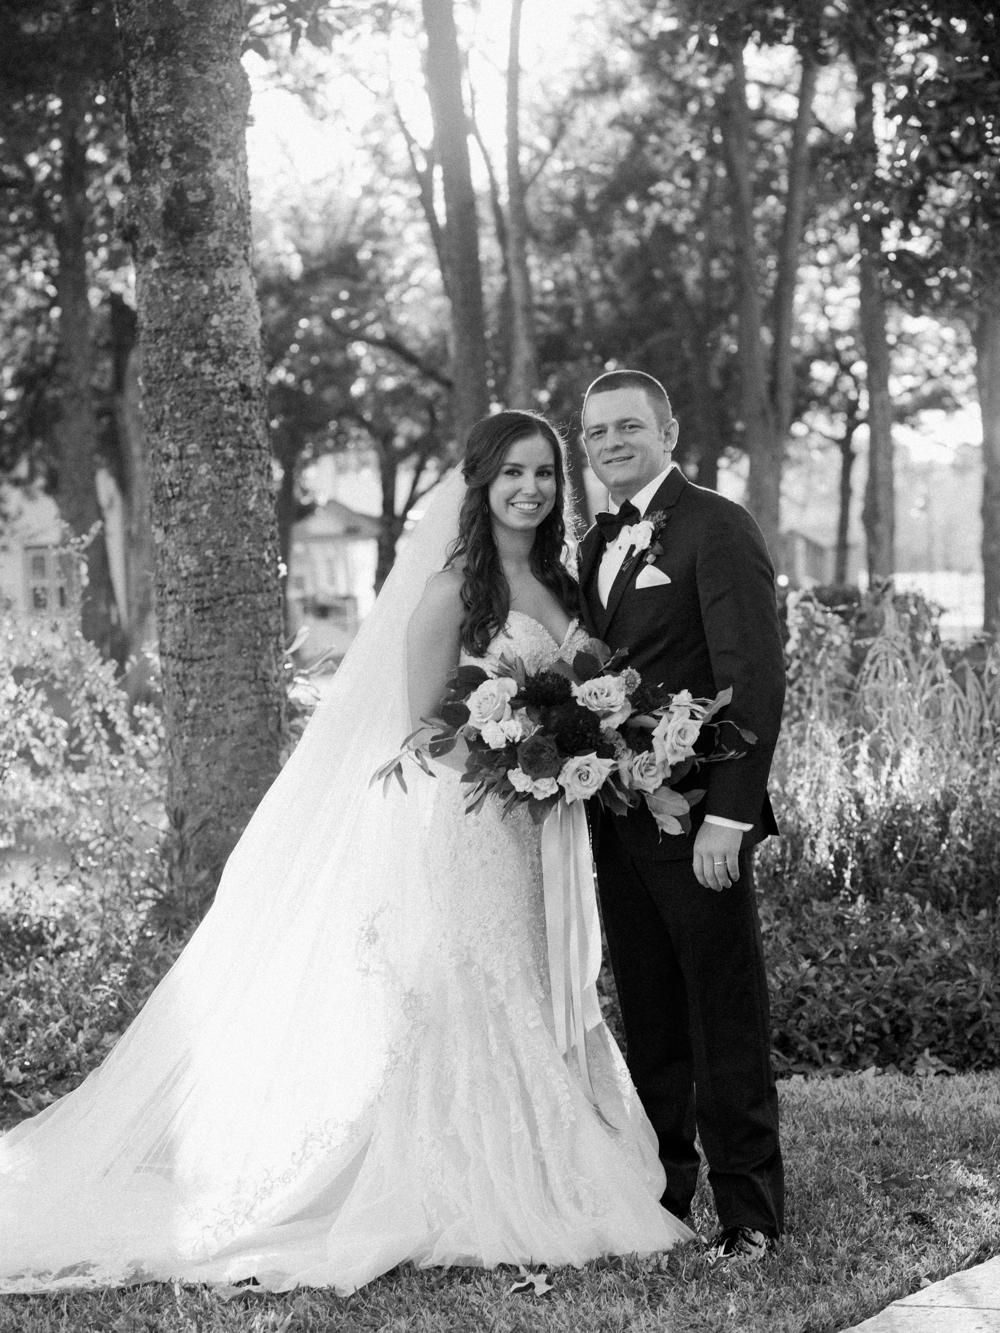 Christine Gosch - destination film photographer - houston wedding photographer - fine art film photographer - elopement photographer - destination wedding - understated wedding - simple beautiful wedding photography-148.jpg